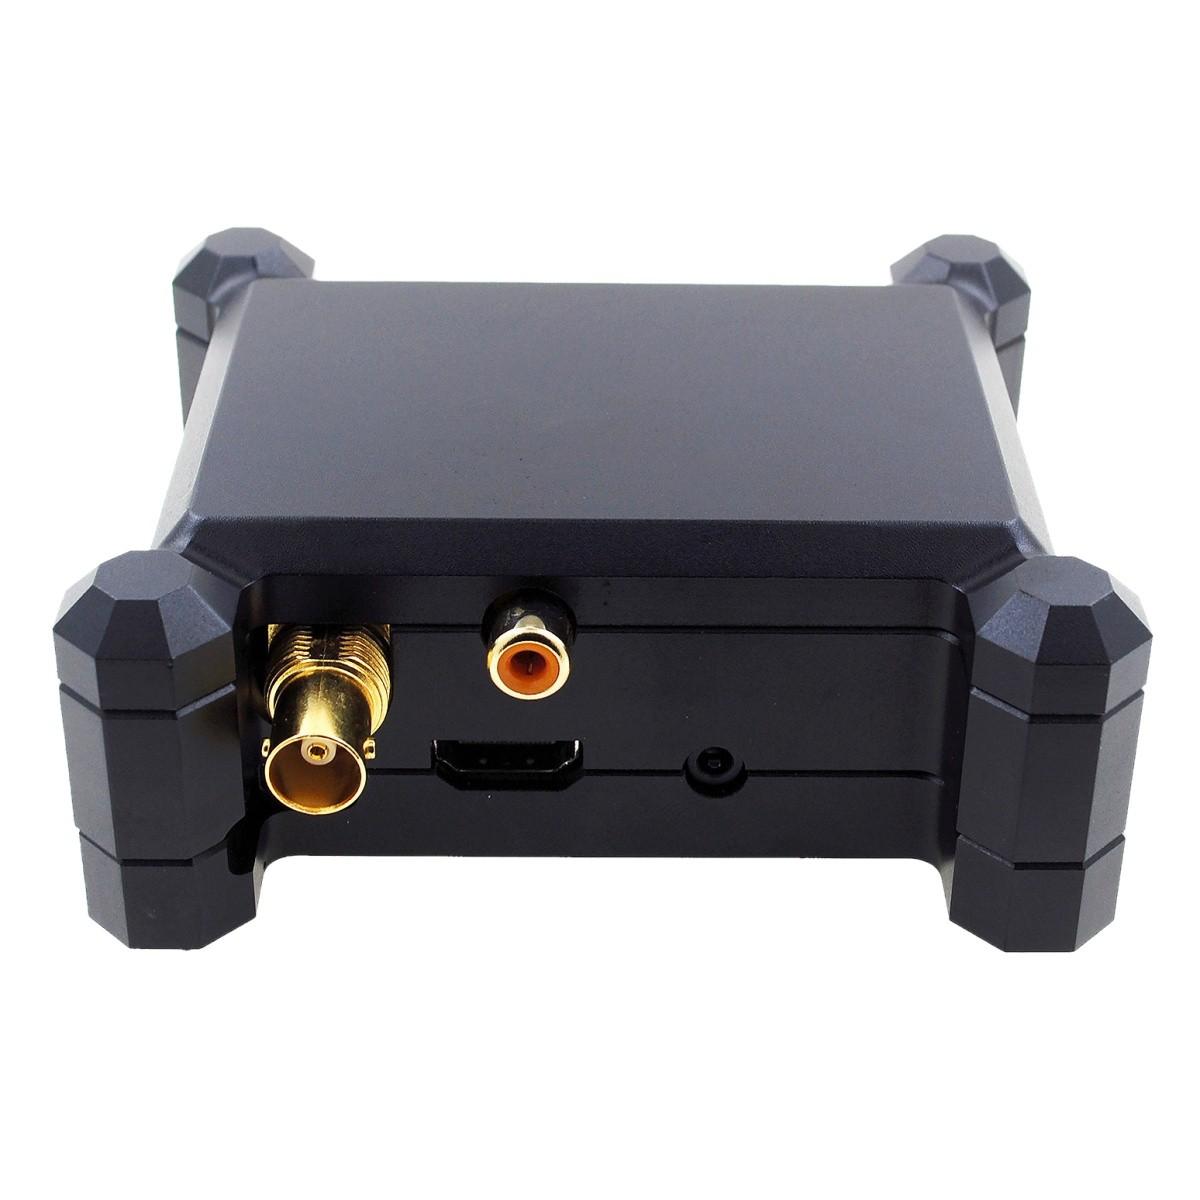 ALLO Boîtier Aluminium pour Allo DigiOne Player et Raspberry Pi 3 Noir